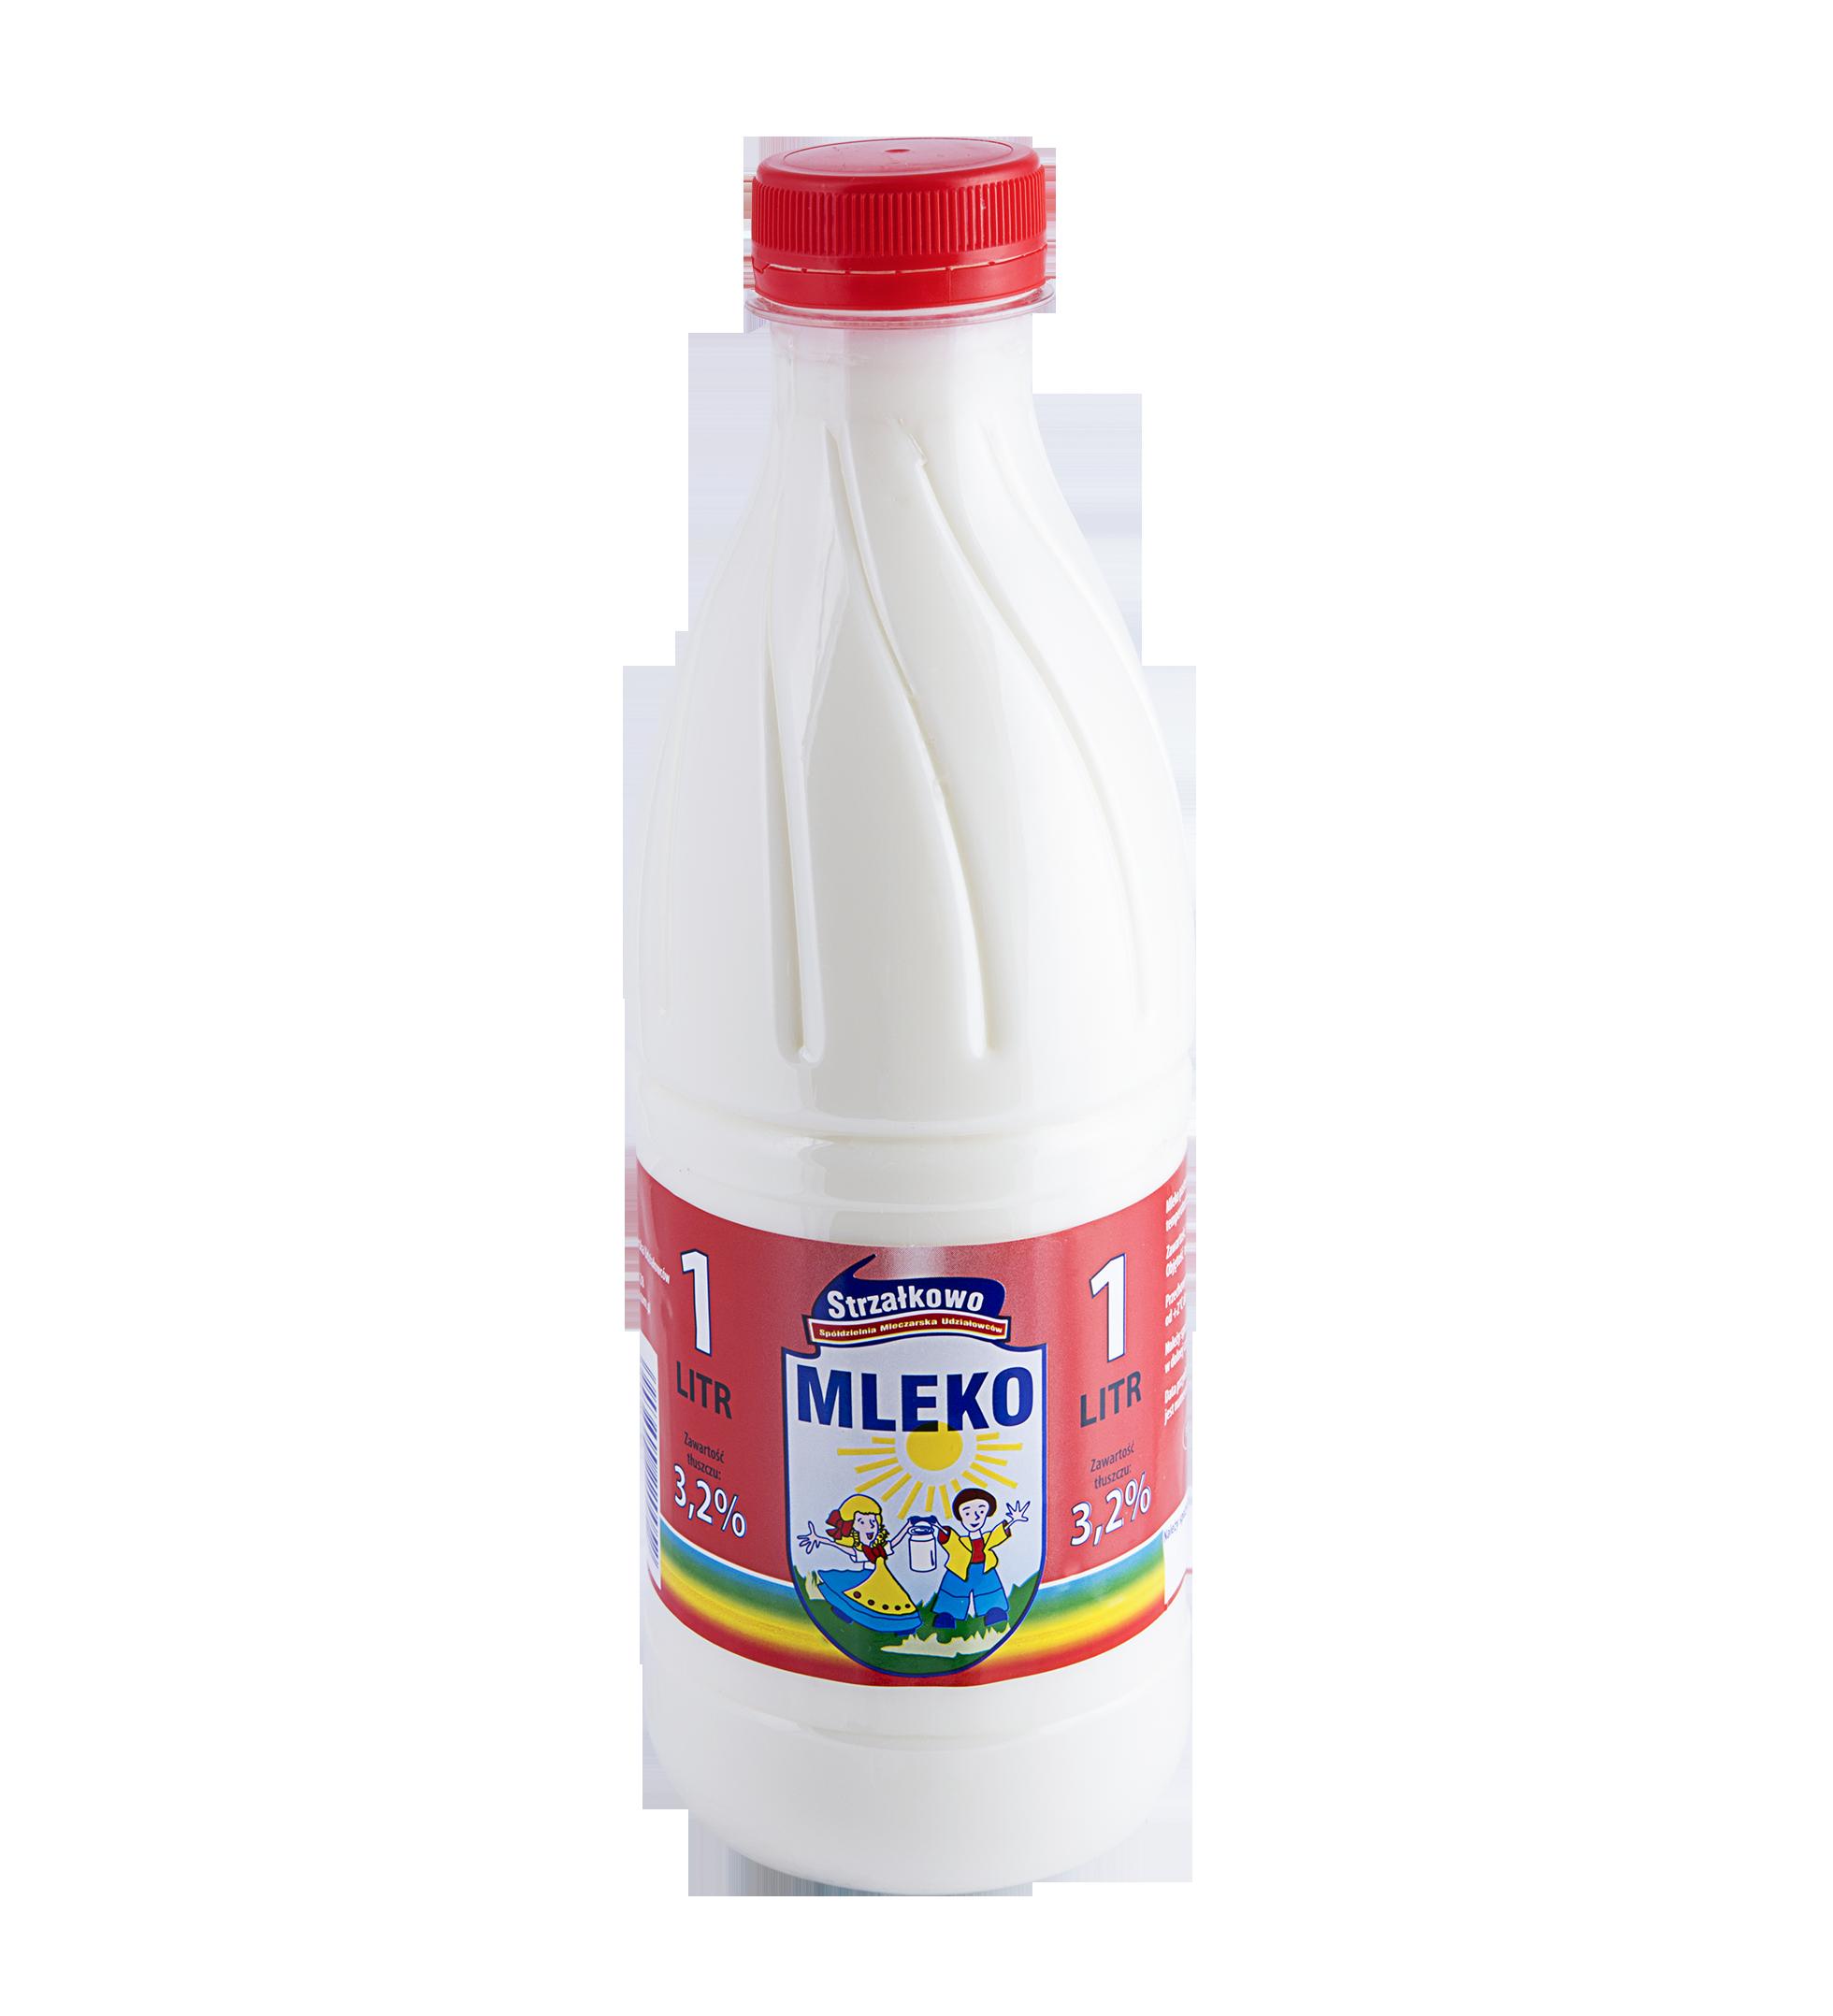 Mleko 3,2% - Mleko PNG